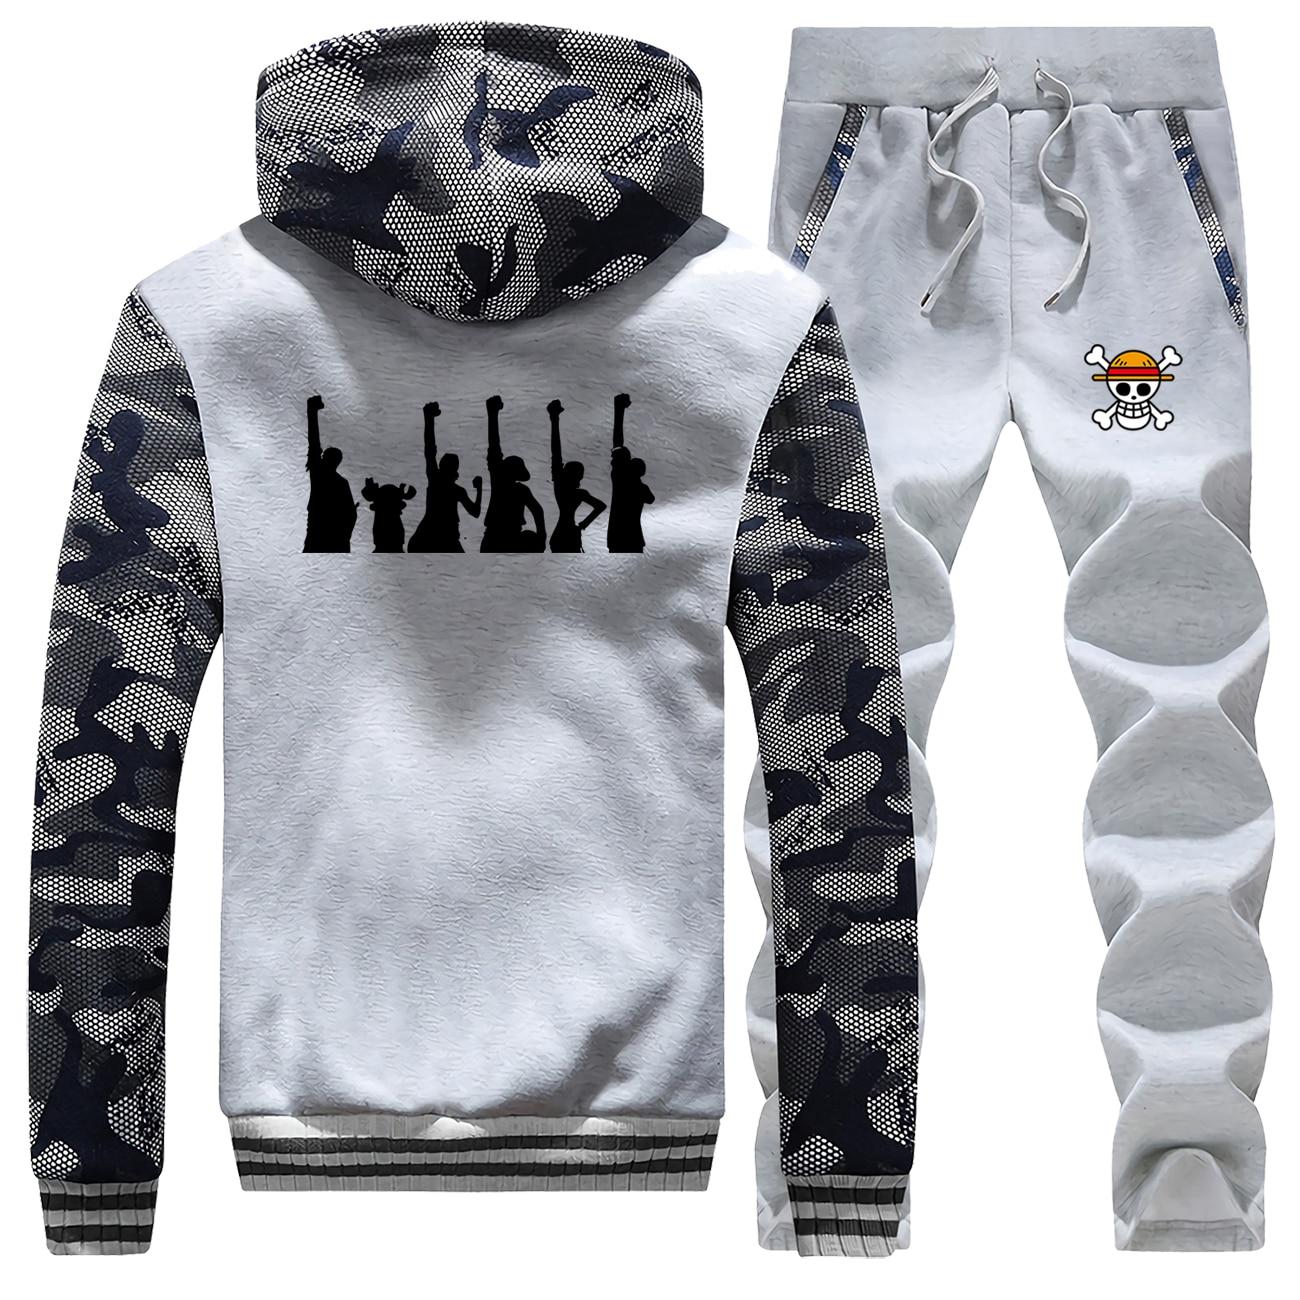 Japan Anime One Piece Mens Hoodies Sportswear Camouflage Coat Thick 2019 Winter New Fleece Warm Jackets Suit+Pants 2 Piece Set